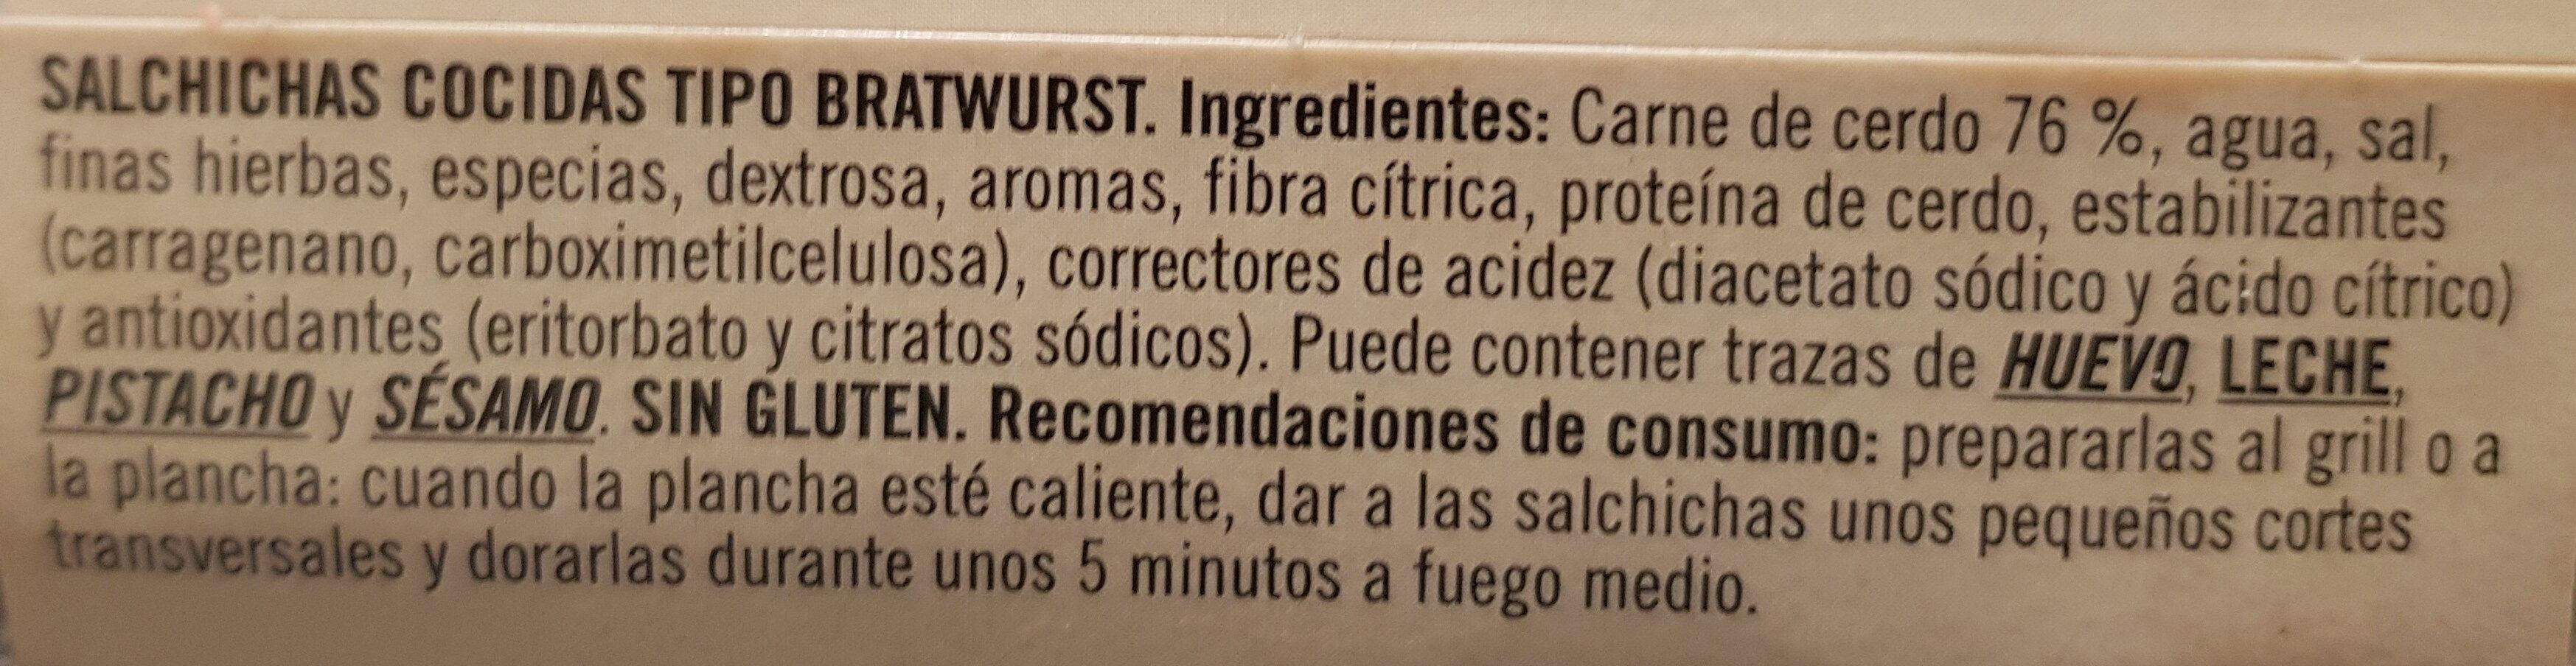 Salchichas bratwurst de cerdo sin gluten sin lactosa - Ingredients - es